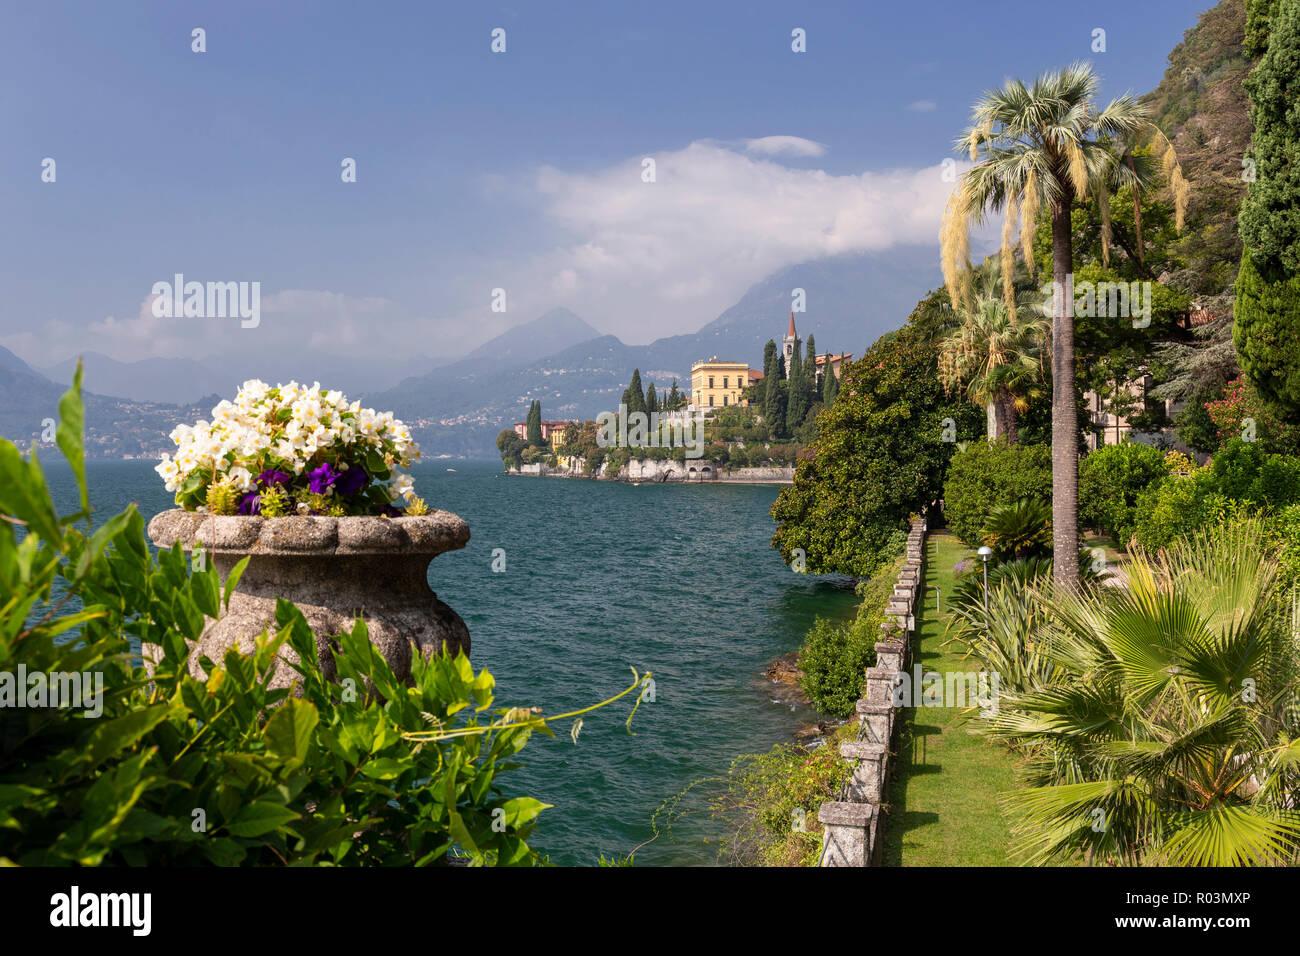 Gardens and buildings of Villa Monastero at Varenna on Lake Como, ItalyStock Photo